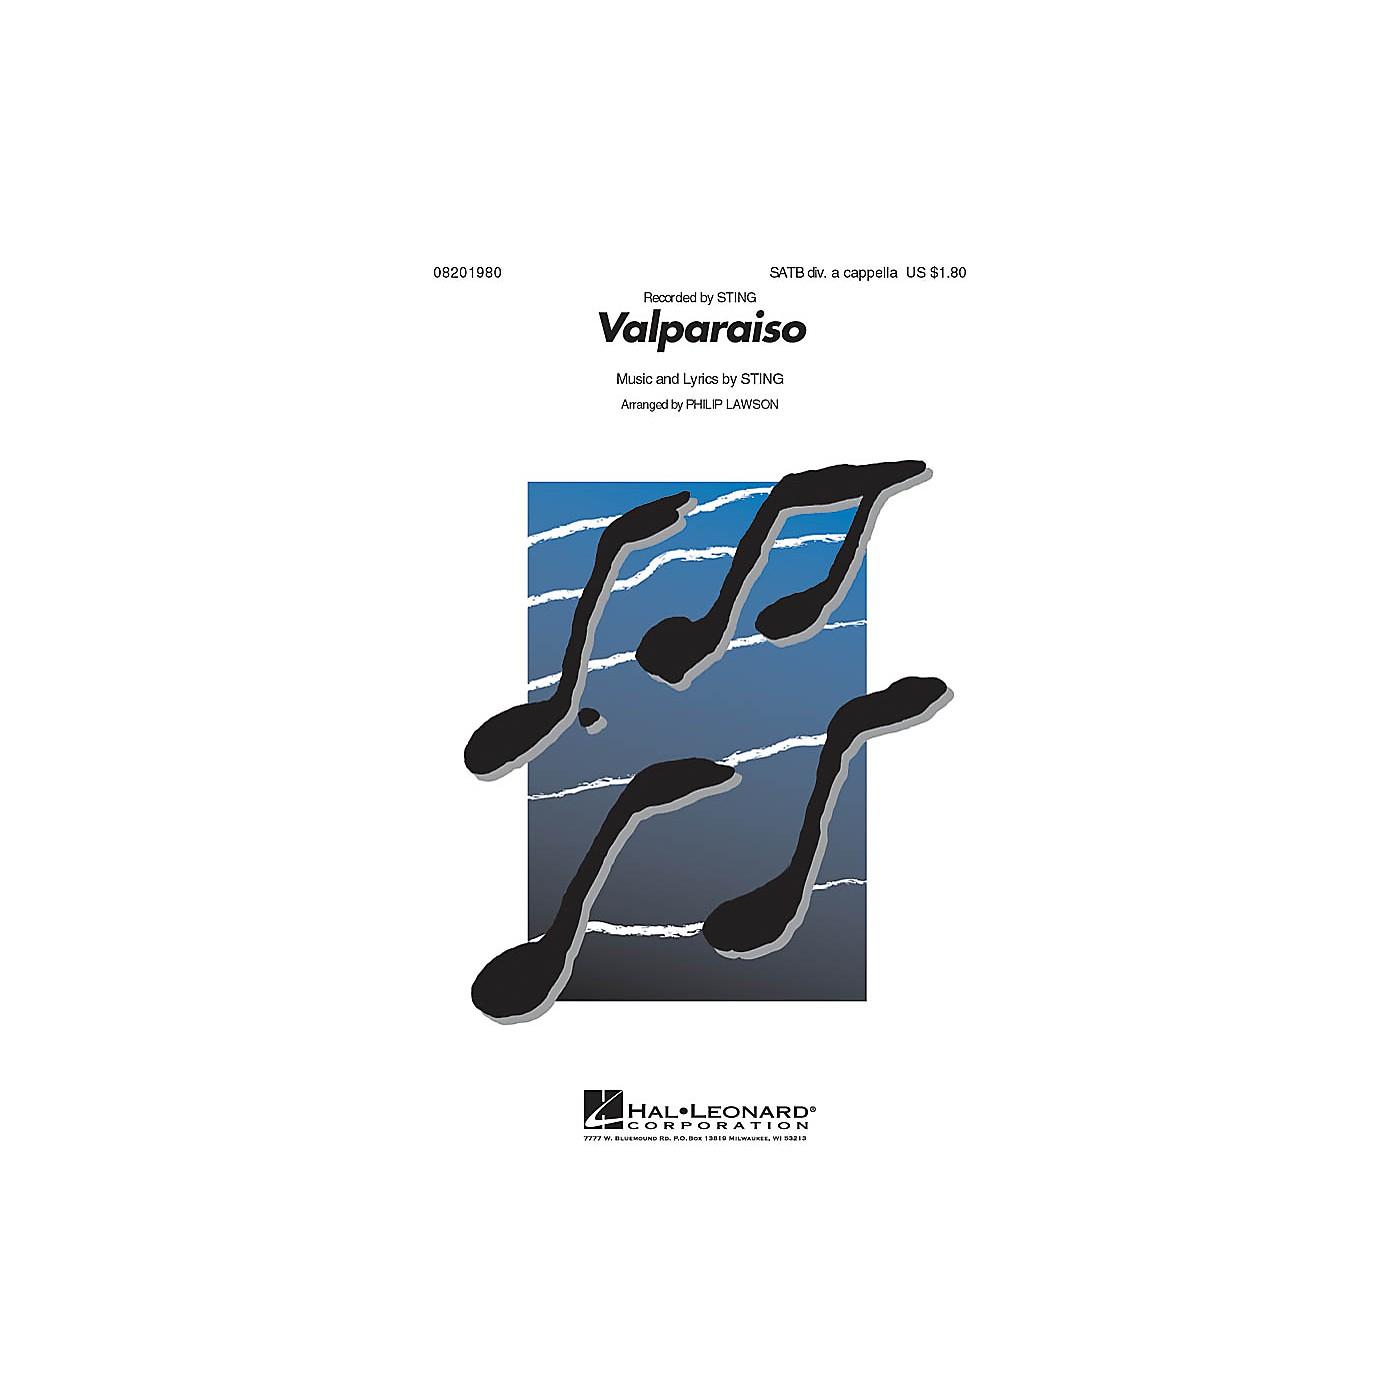 Hal Leonard Valparaiso SATB DV A Cappella by Sting arranged by Philip Lawson thumbnail